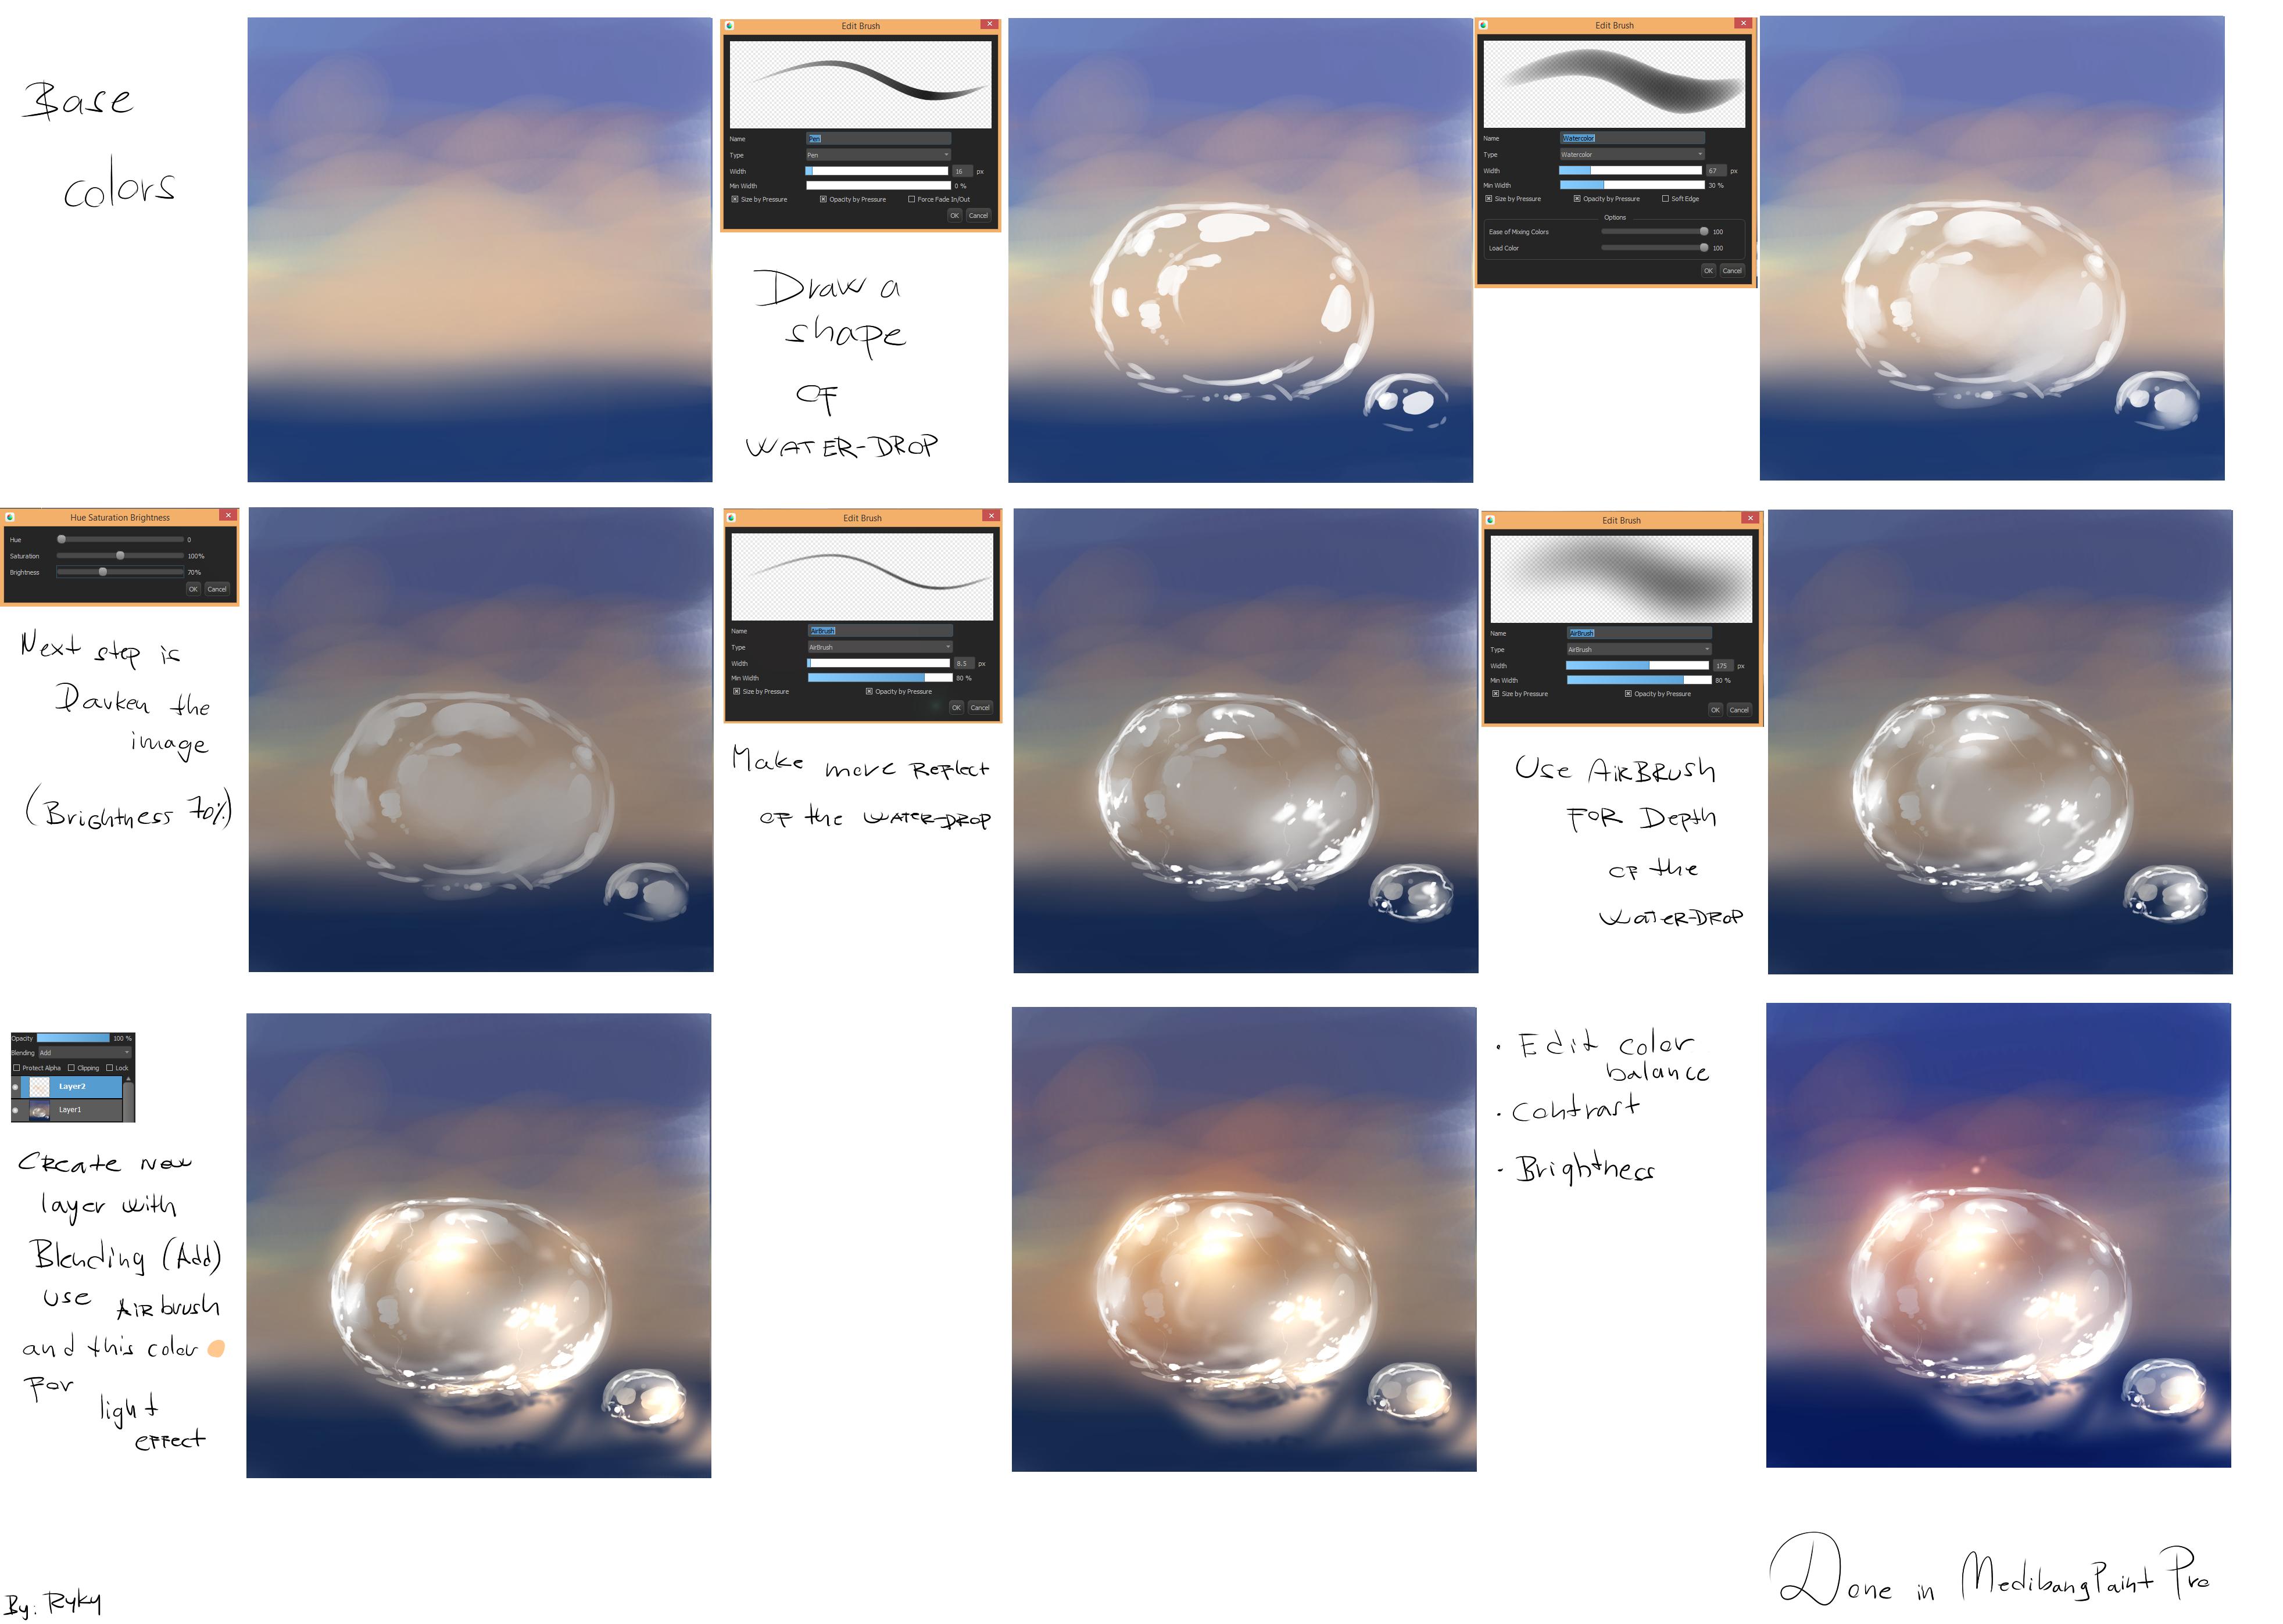 Drawn water droplets easy Tutorials Ryky's and MediBang See